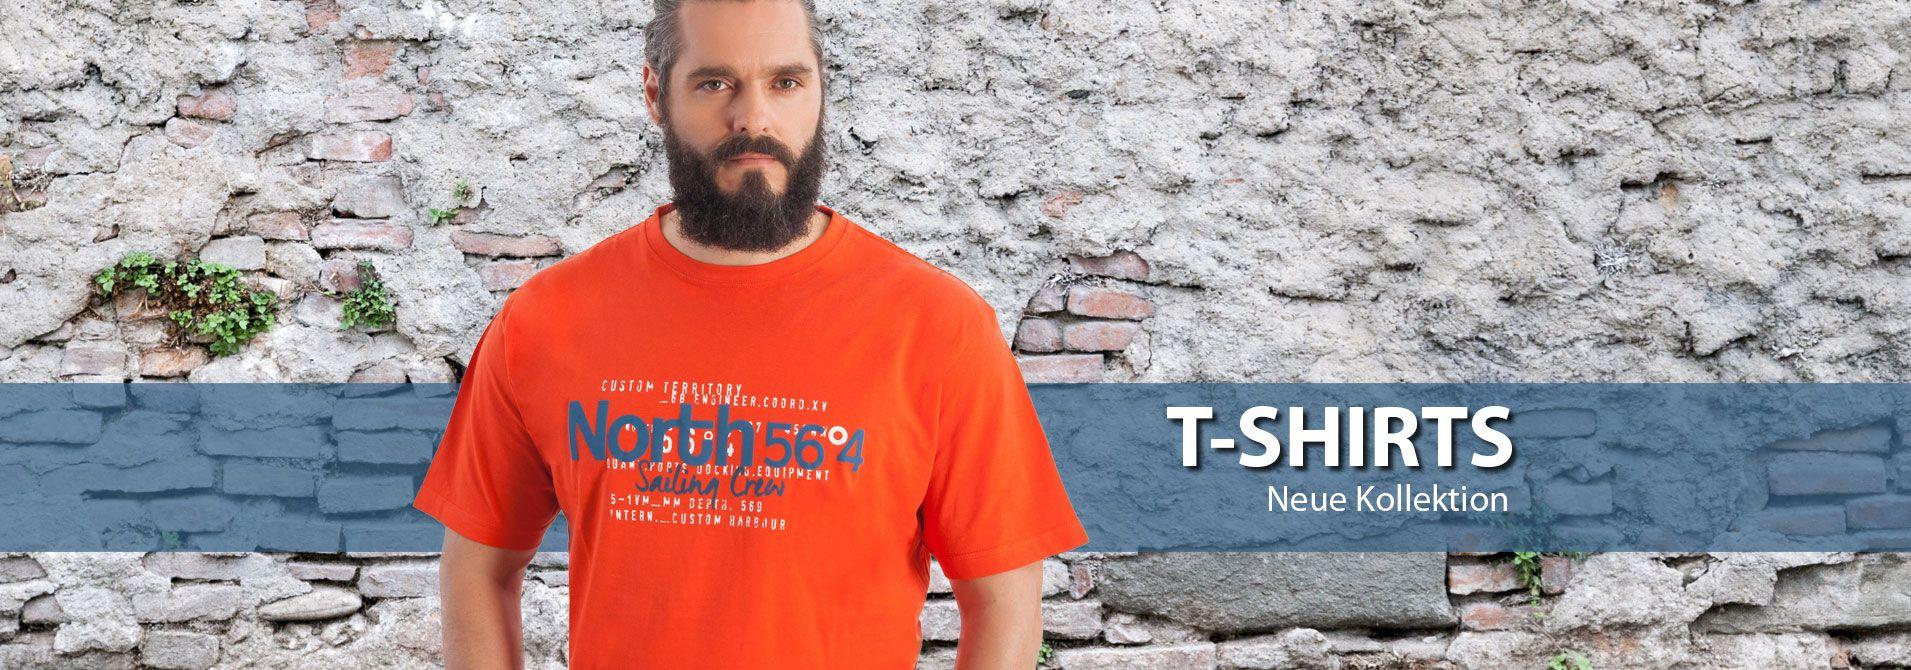 Kurzarm T-Shirts Übergröße